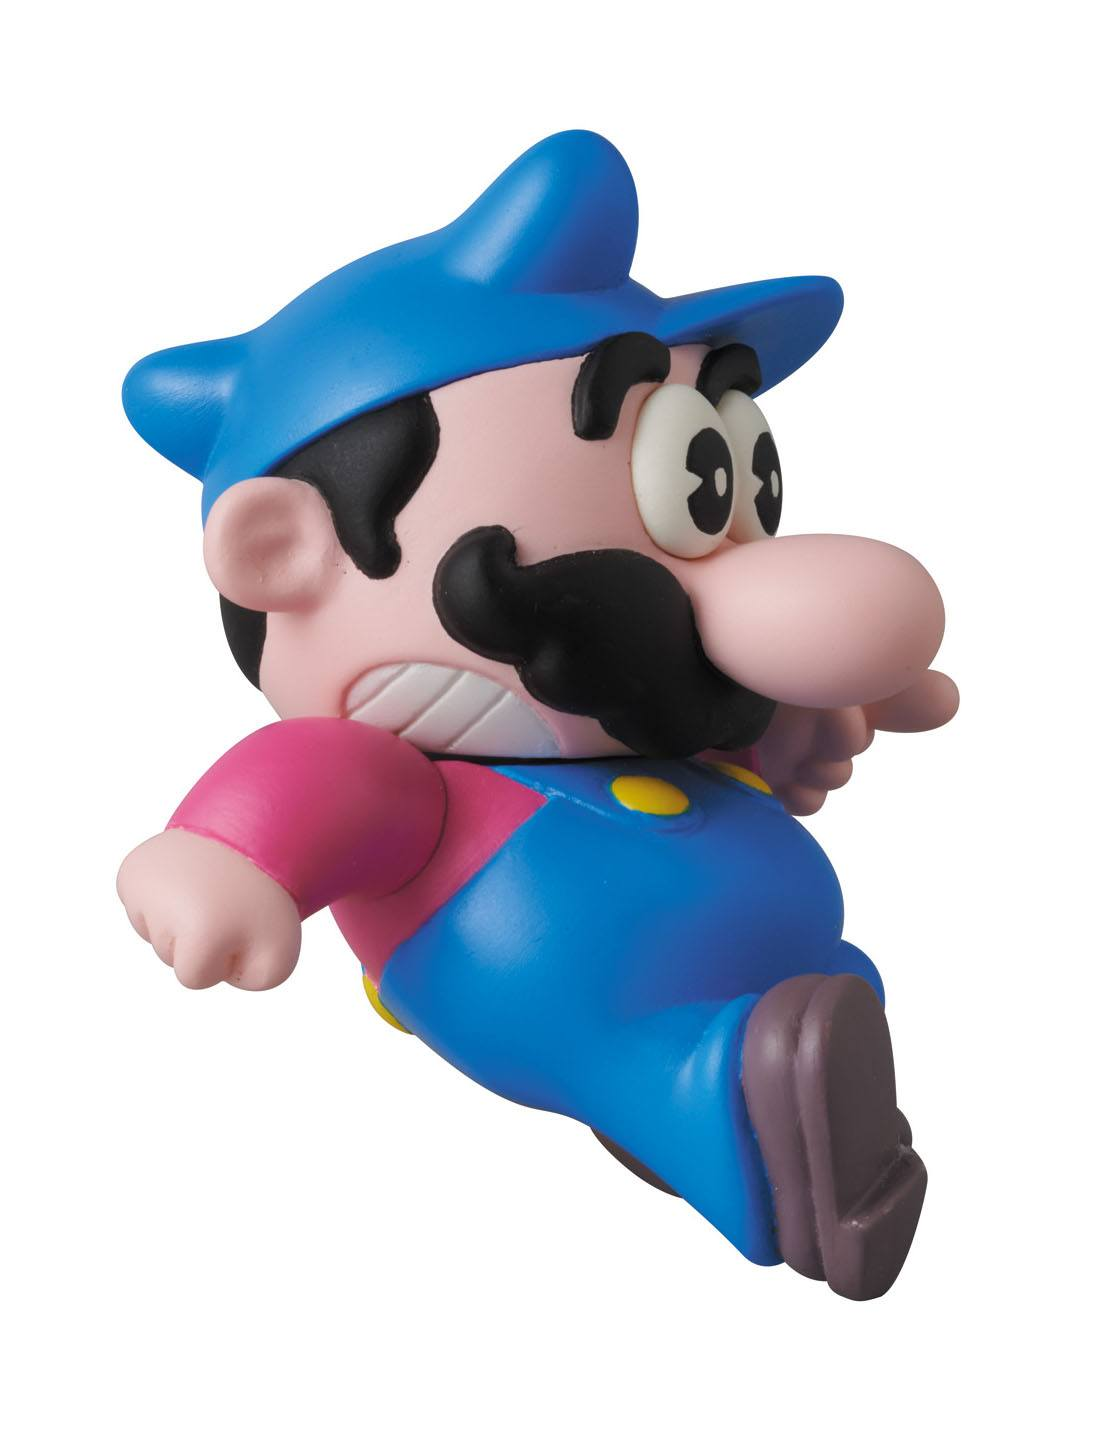 Nintendo UDF Series 2 Mini Figure Mario (Mario Bros.) 6 cm